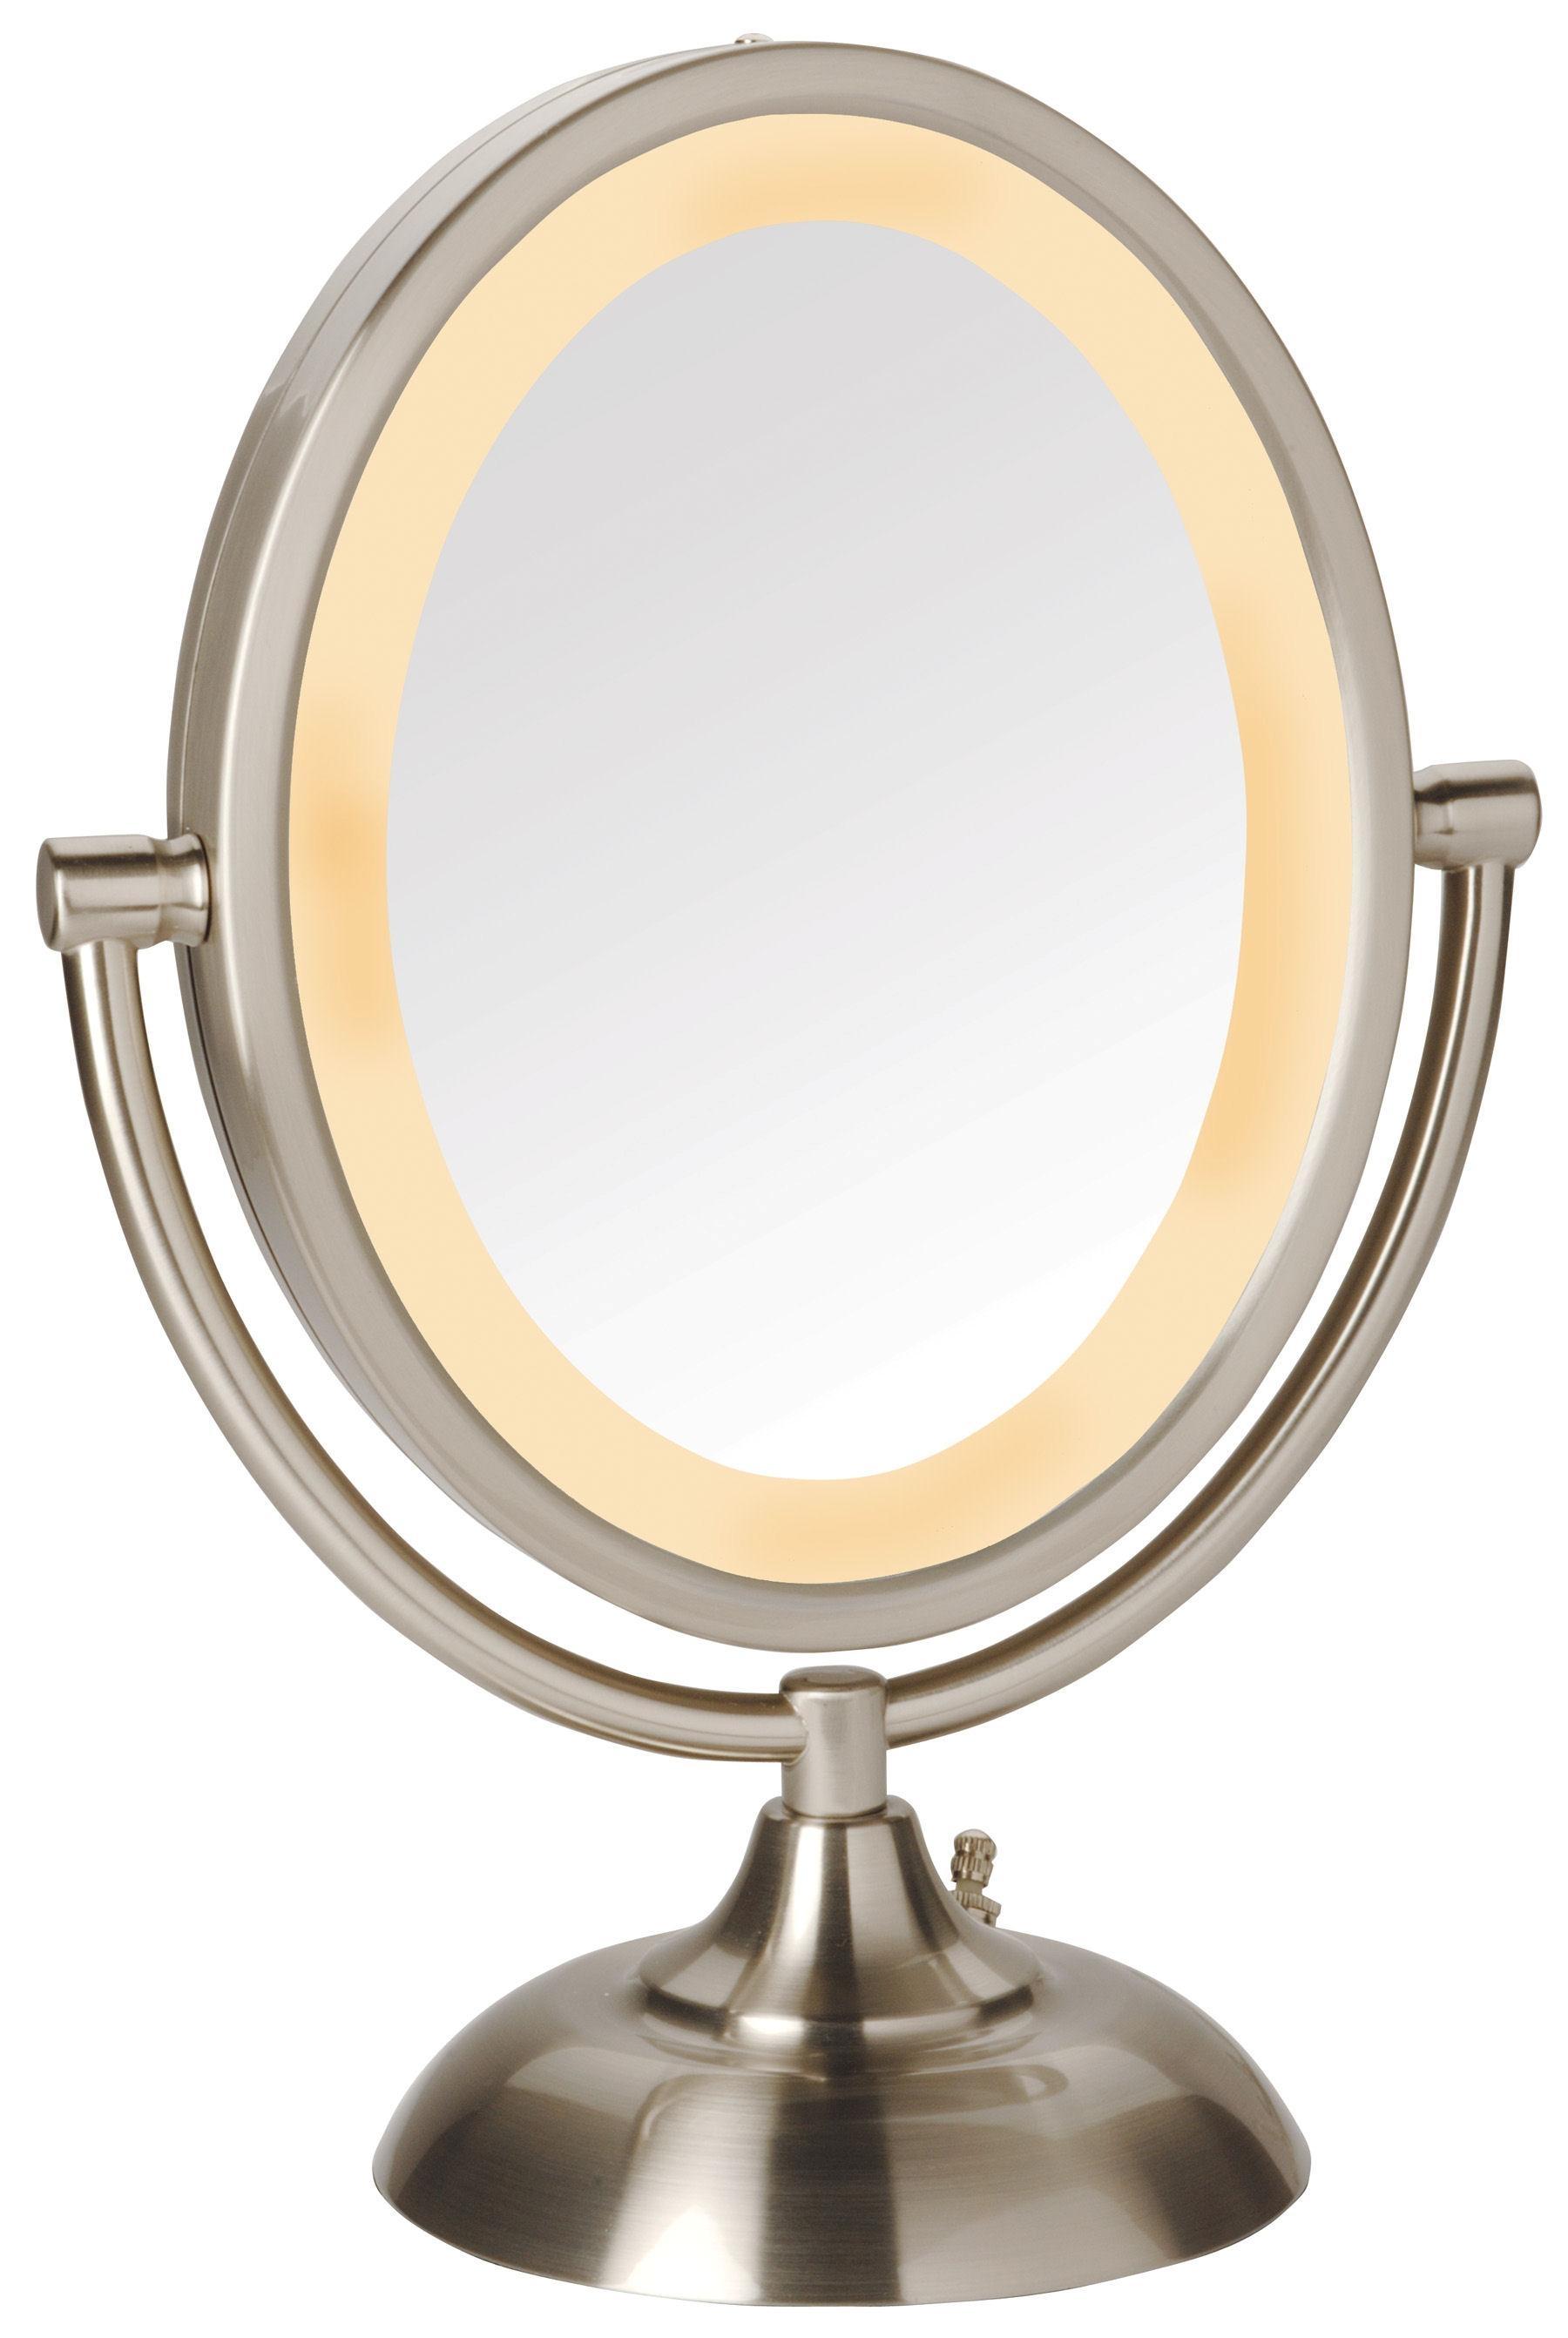 Lights For Makeup Mirror Lighted | Home Lighting Ideass31 49 Regarding Lit Makeup Mirrors (View 20 of 20)